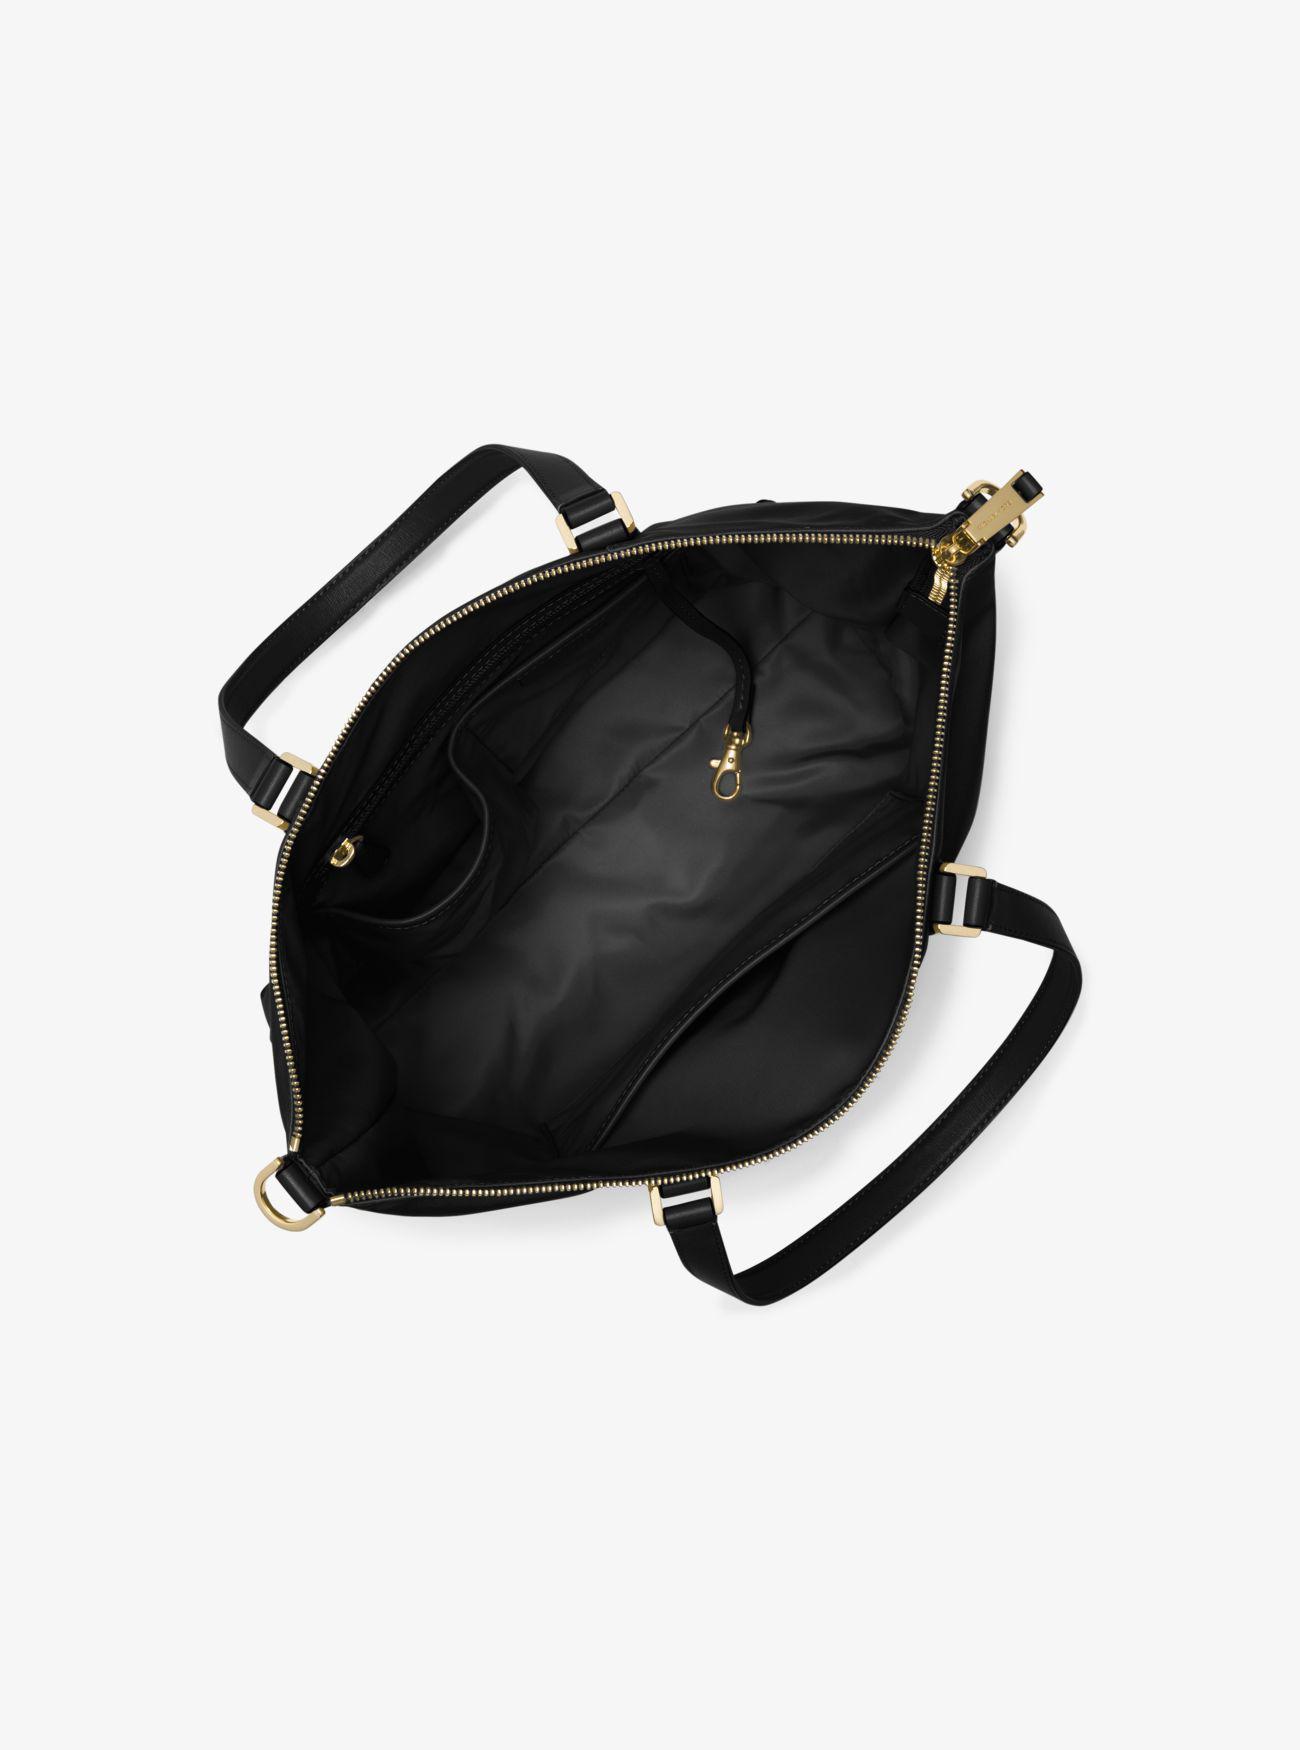 47de2a72b0e1 Michael Kors Ariana Large Nylon Tote Bag in Black - Lyst